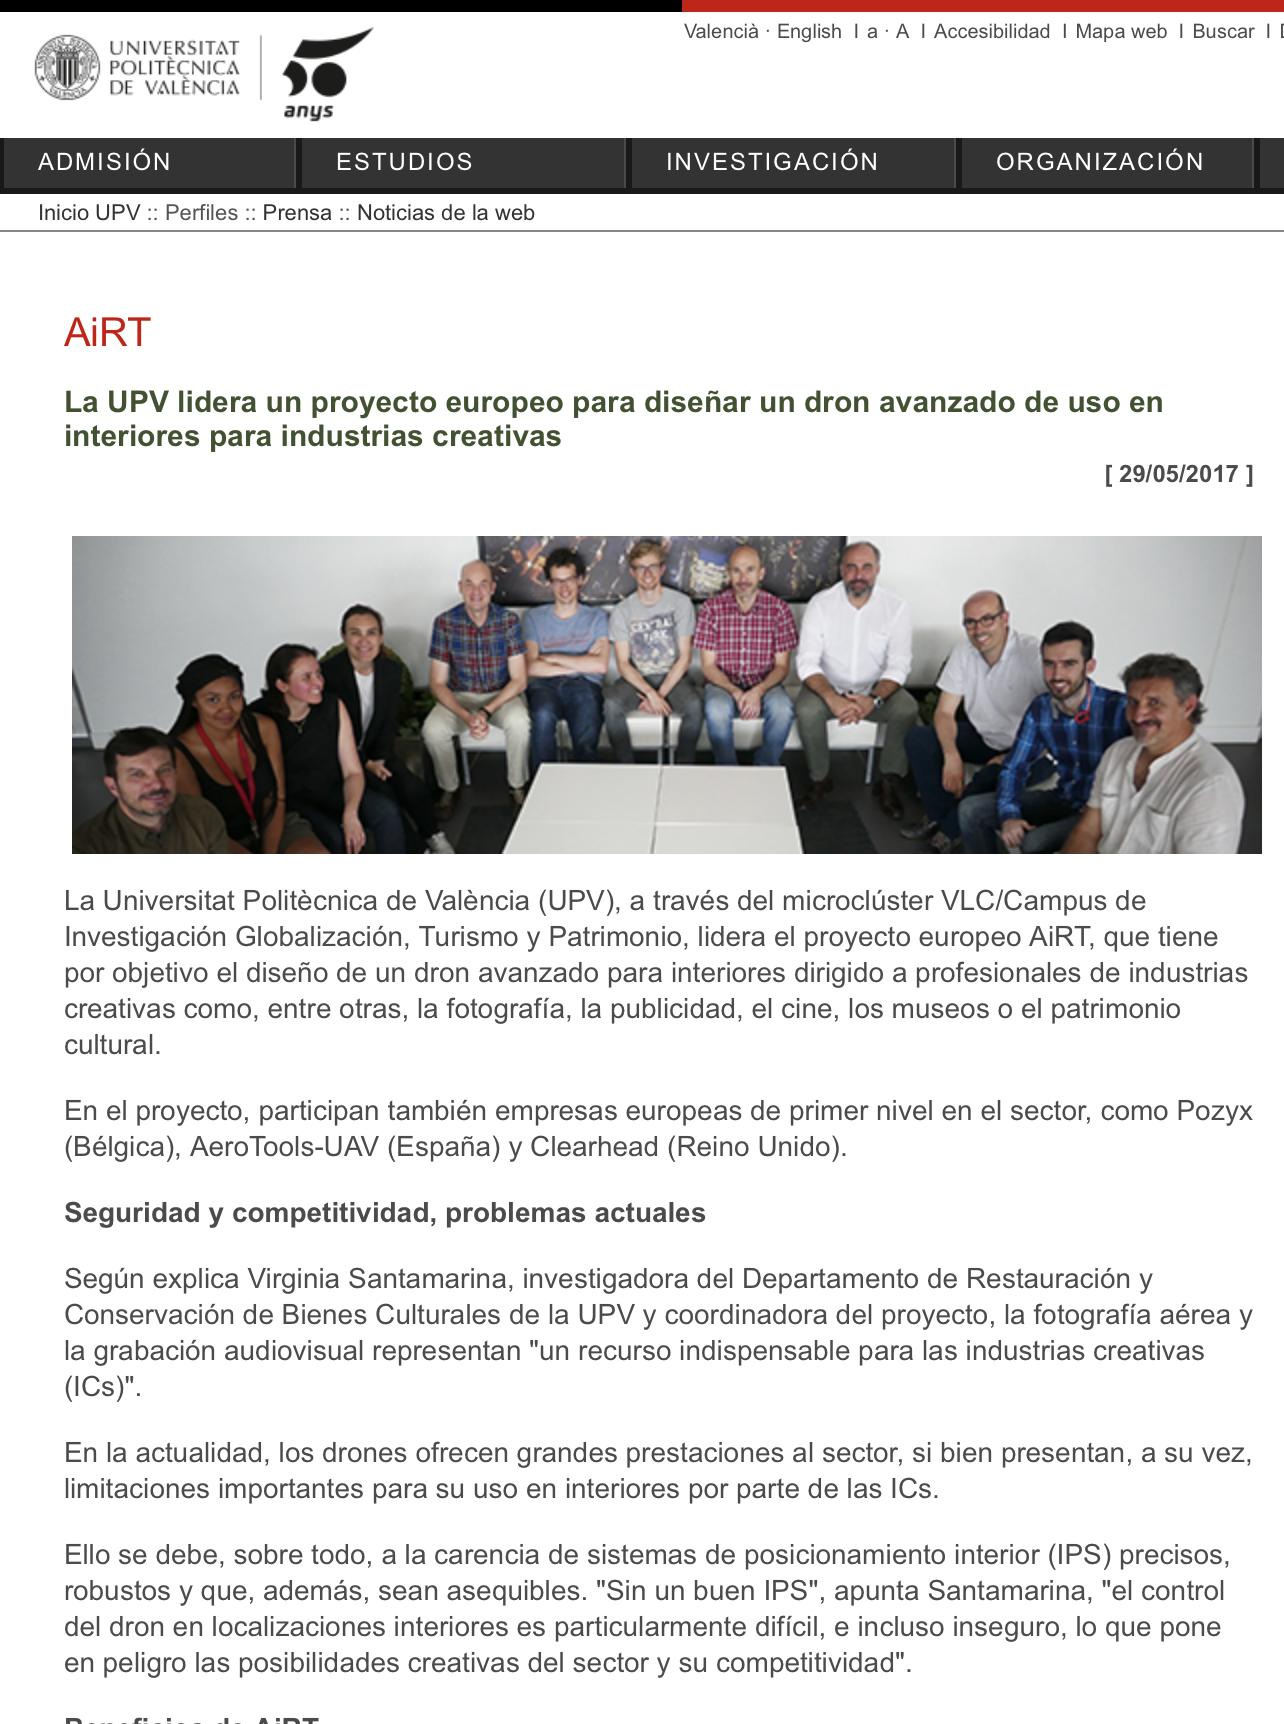 AiRT in UPV